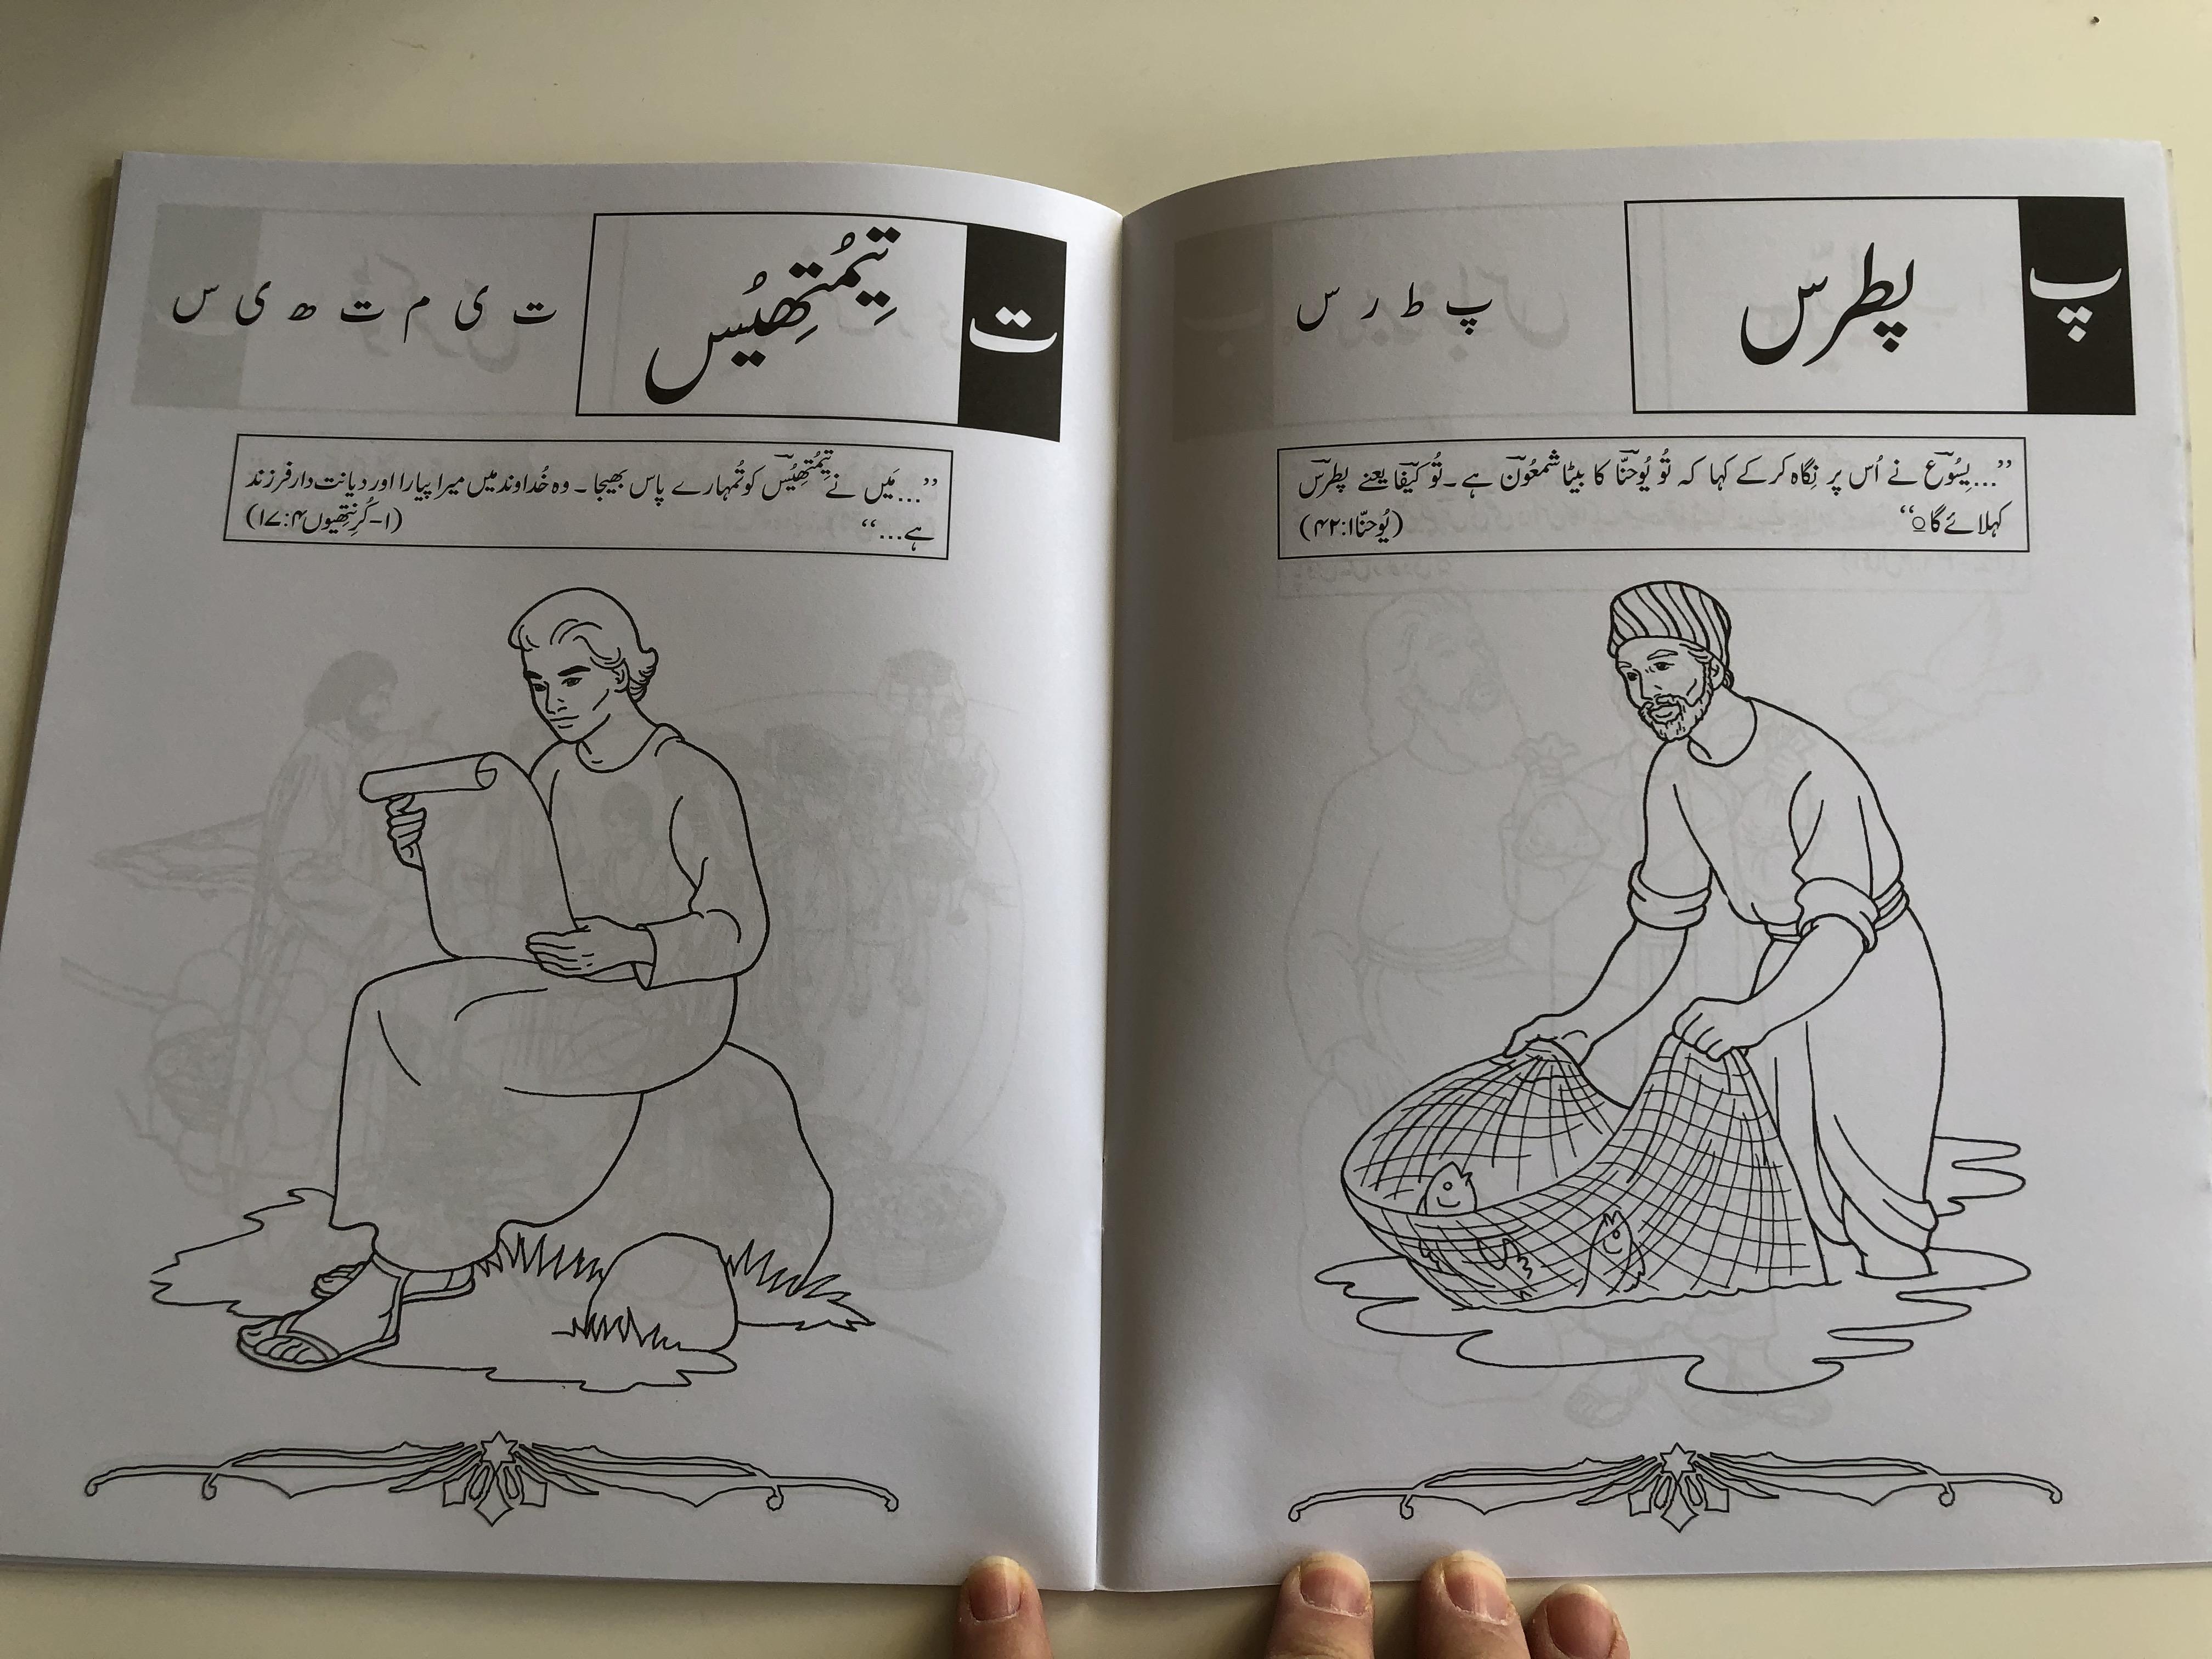 abc-of-the-bible-urdu-language-children-s-coloring-book-paperback-3.jpg